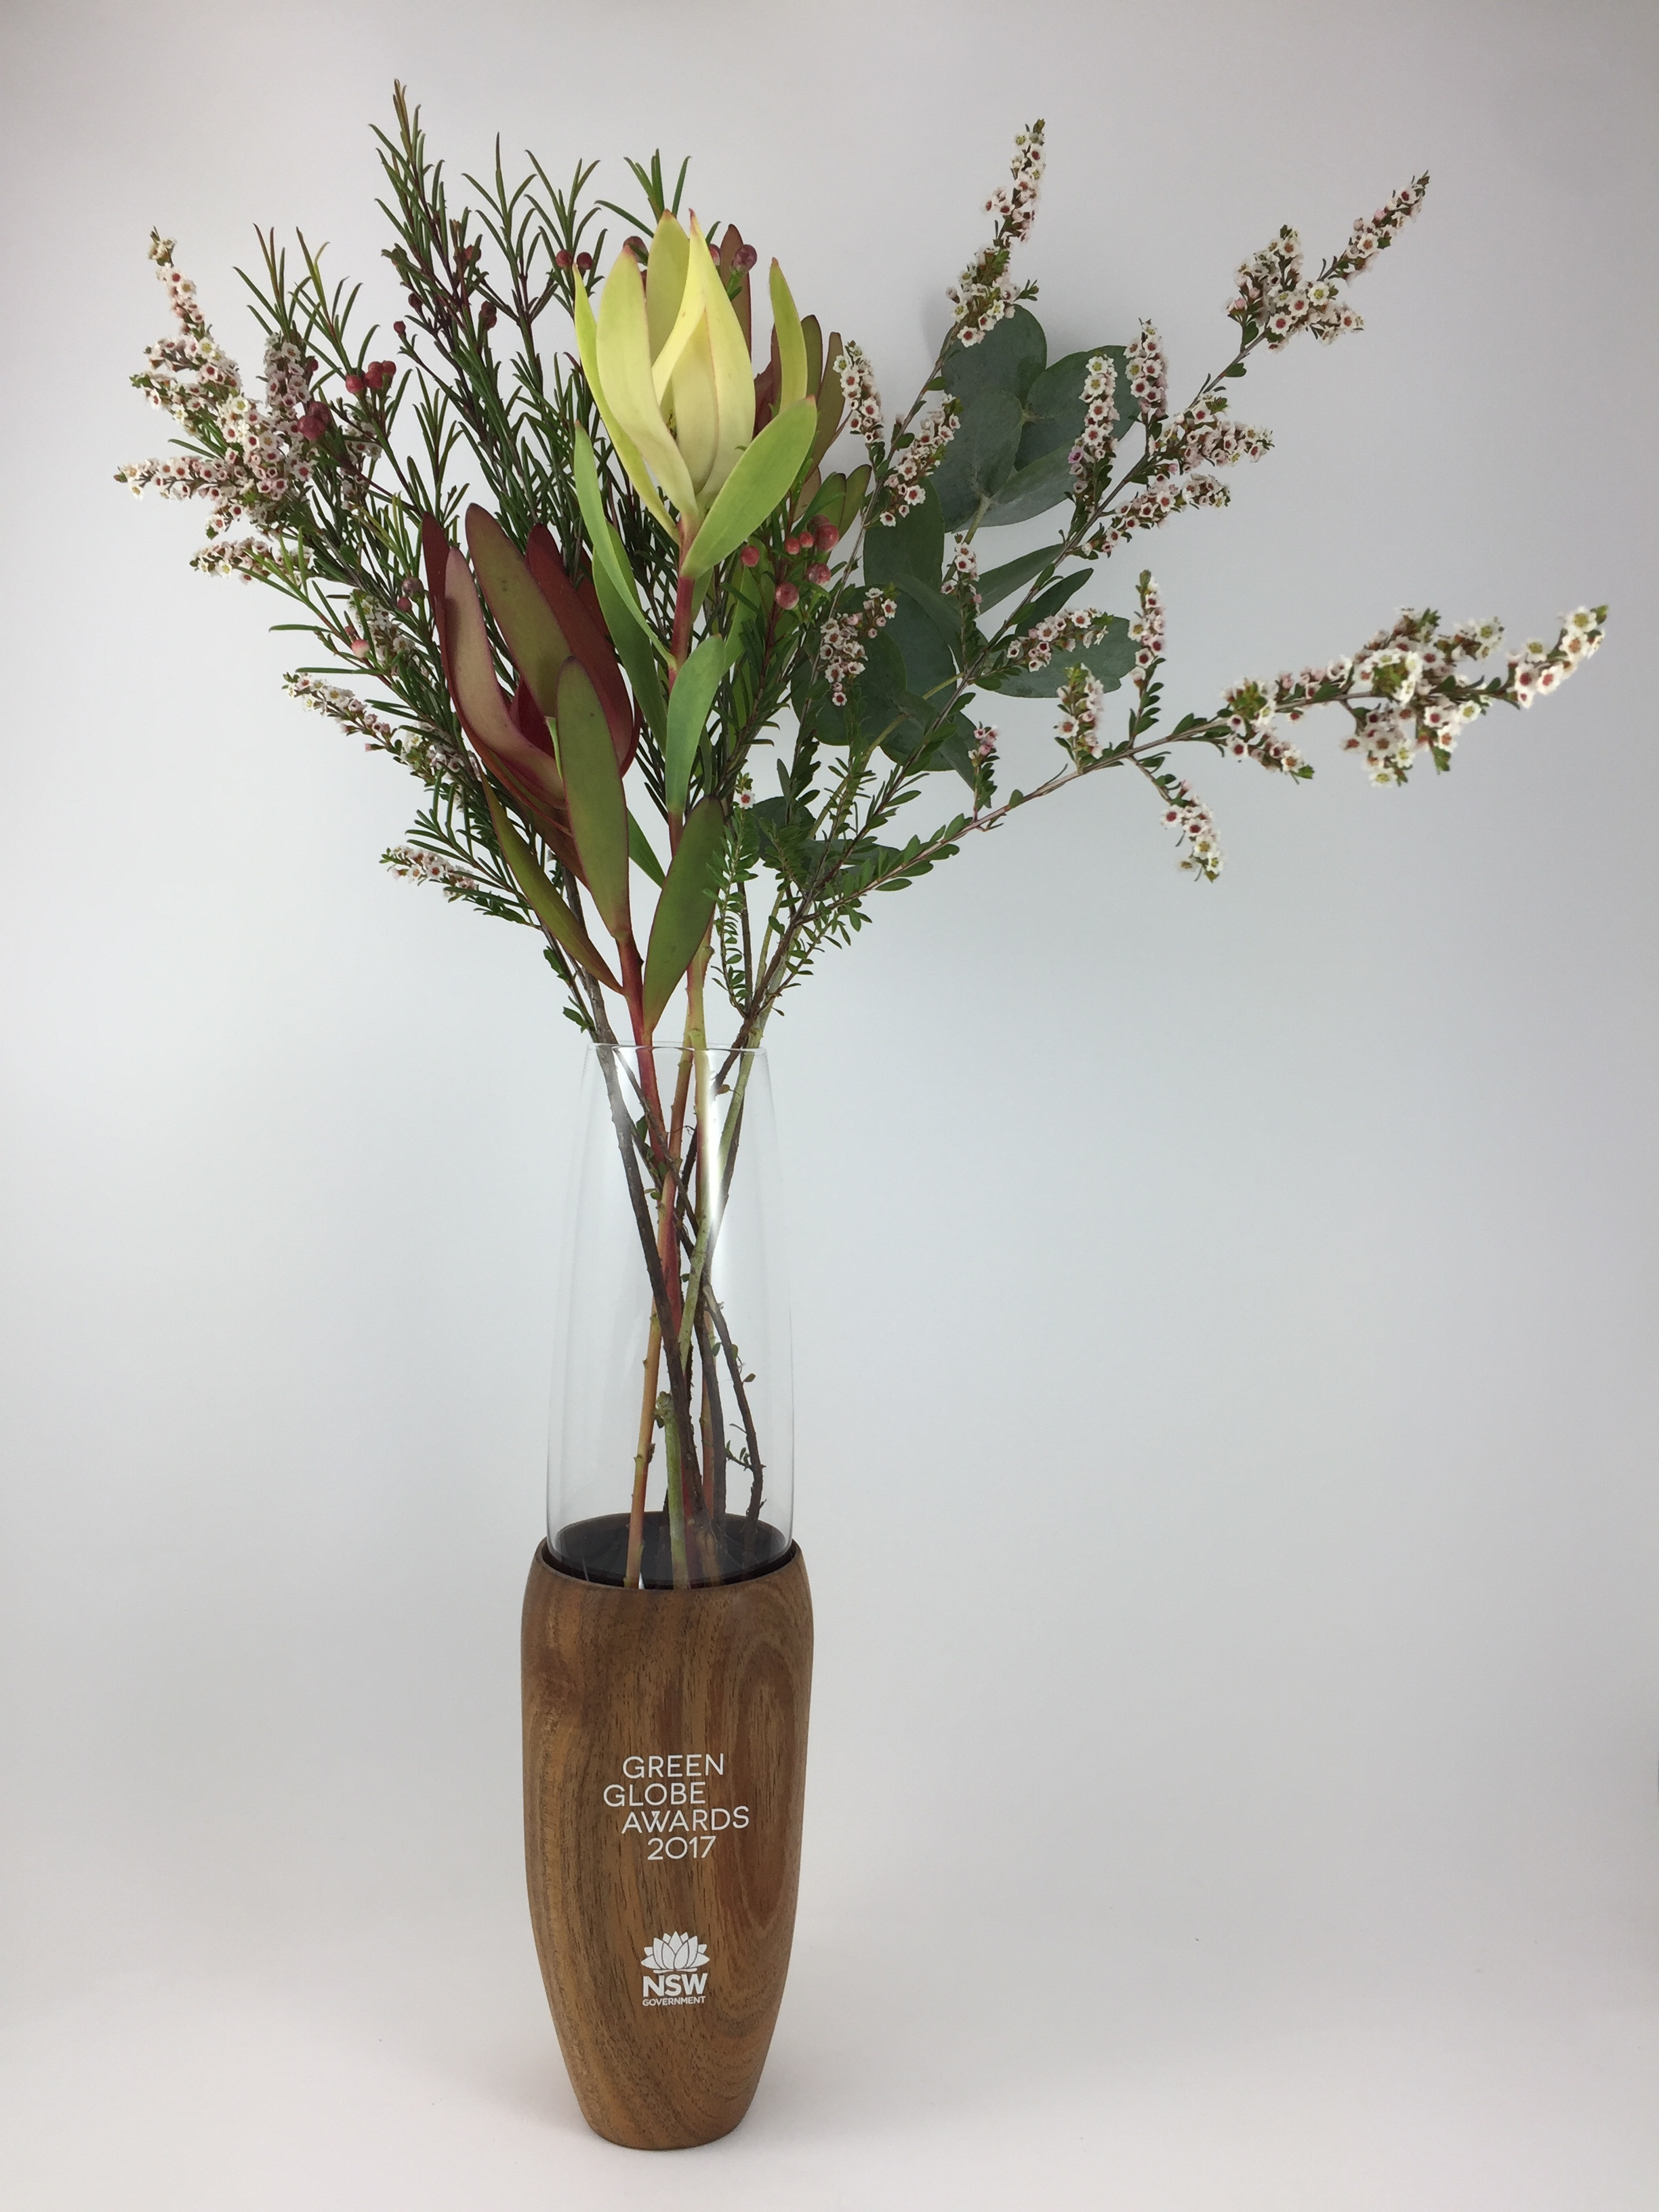 green-globe-awards-timber-eco-glass-trophy-vase-03.jpg